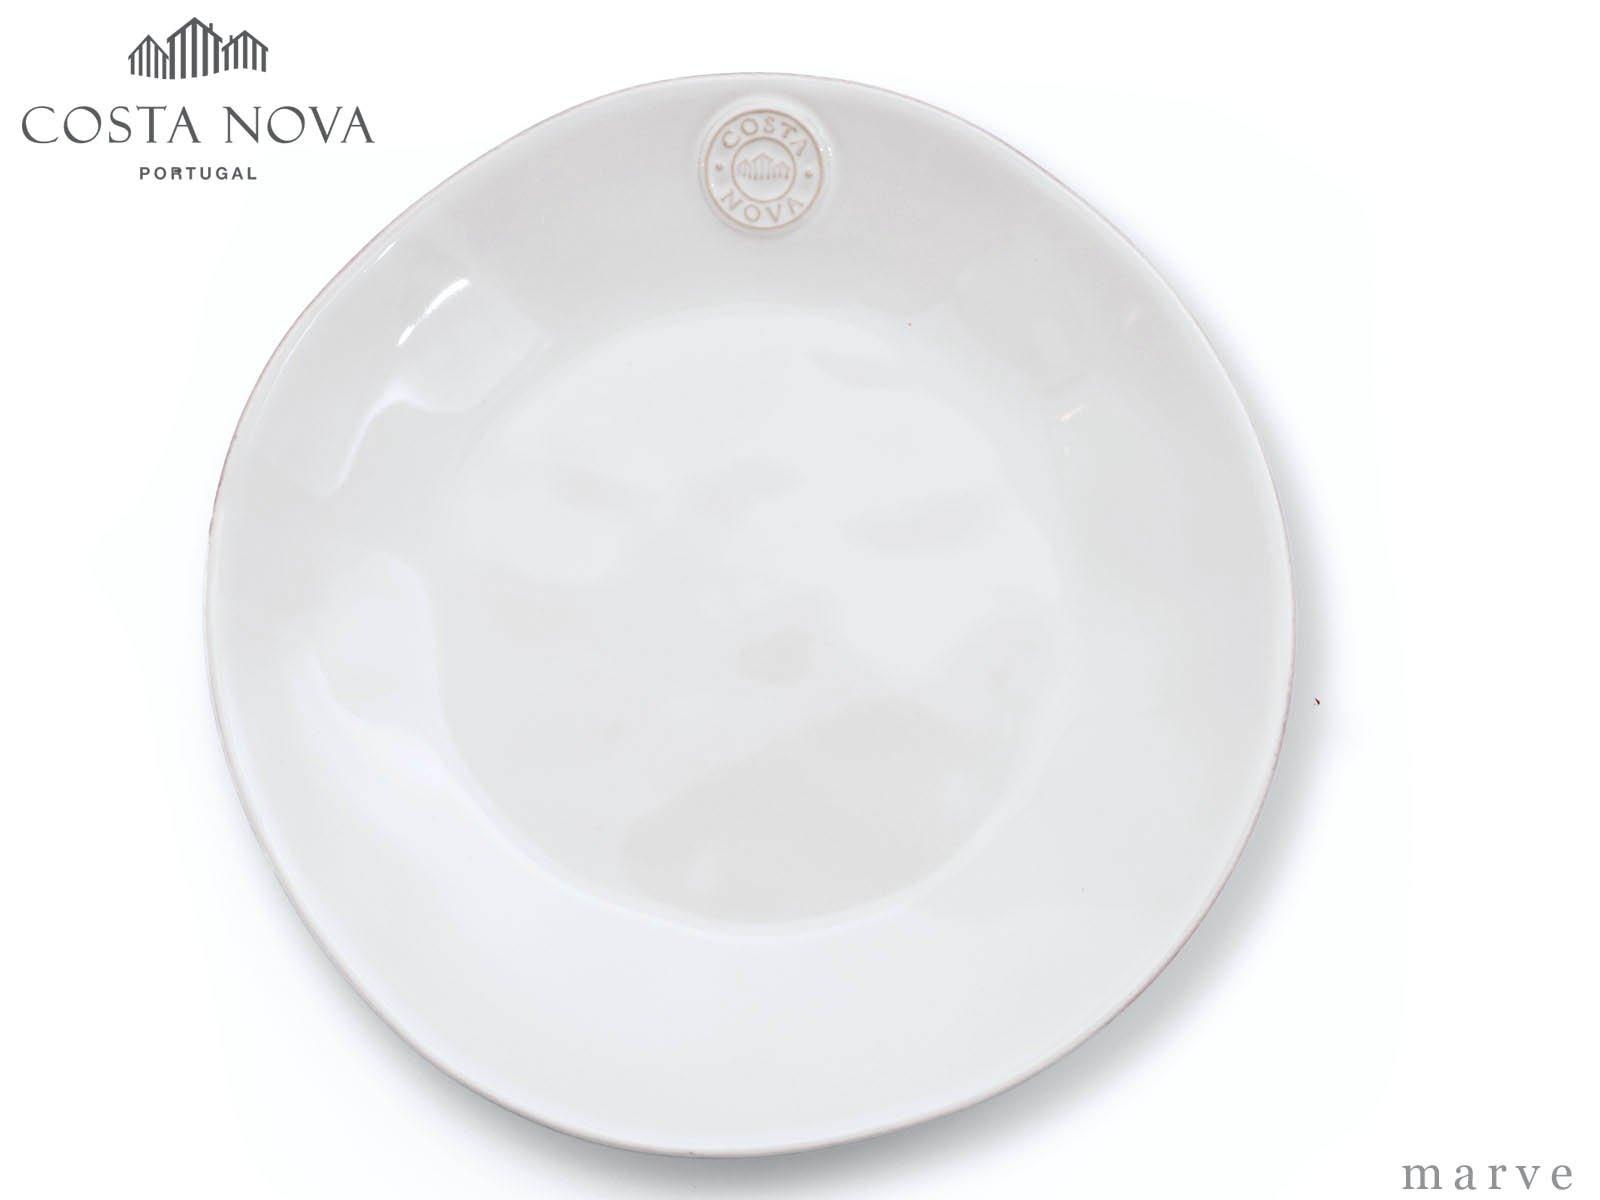 COSTA NOVA(コスタ・ノバ) ノバ ディナープレート ホワイト